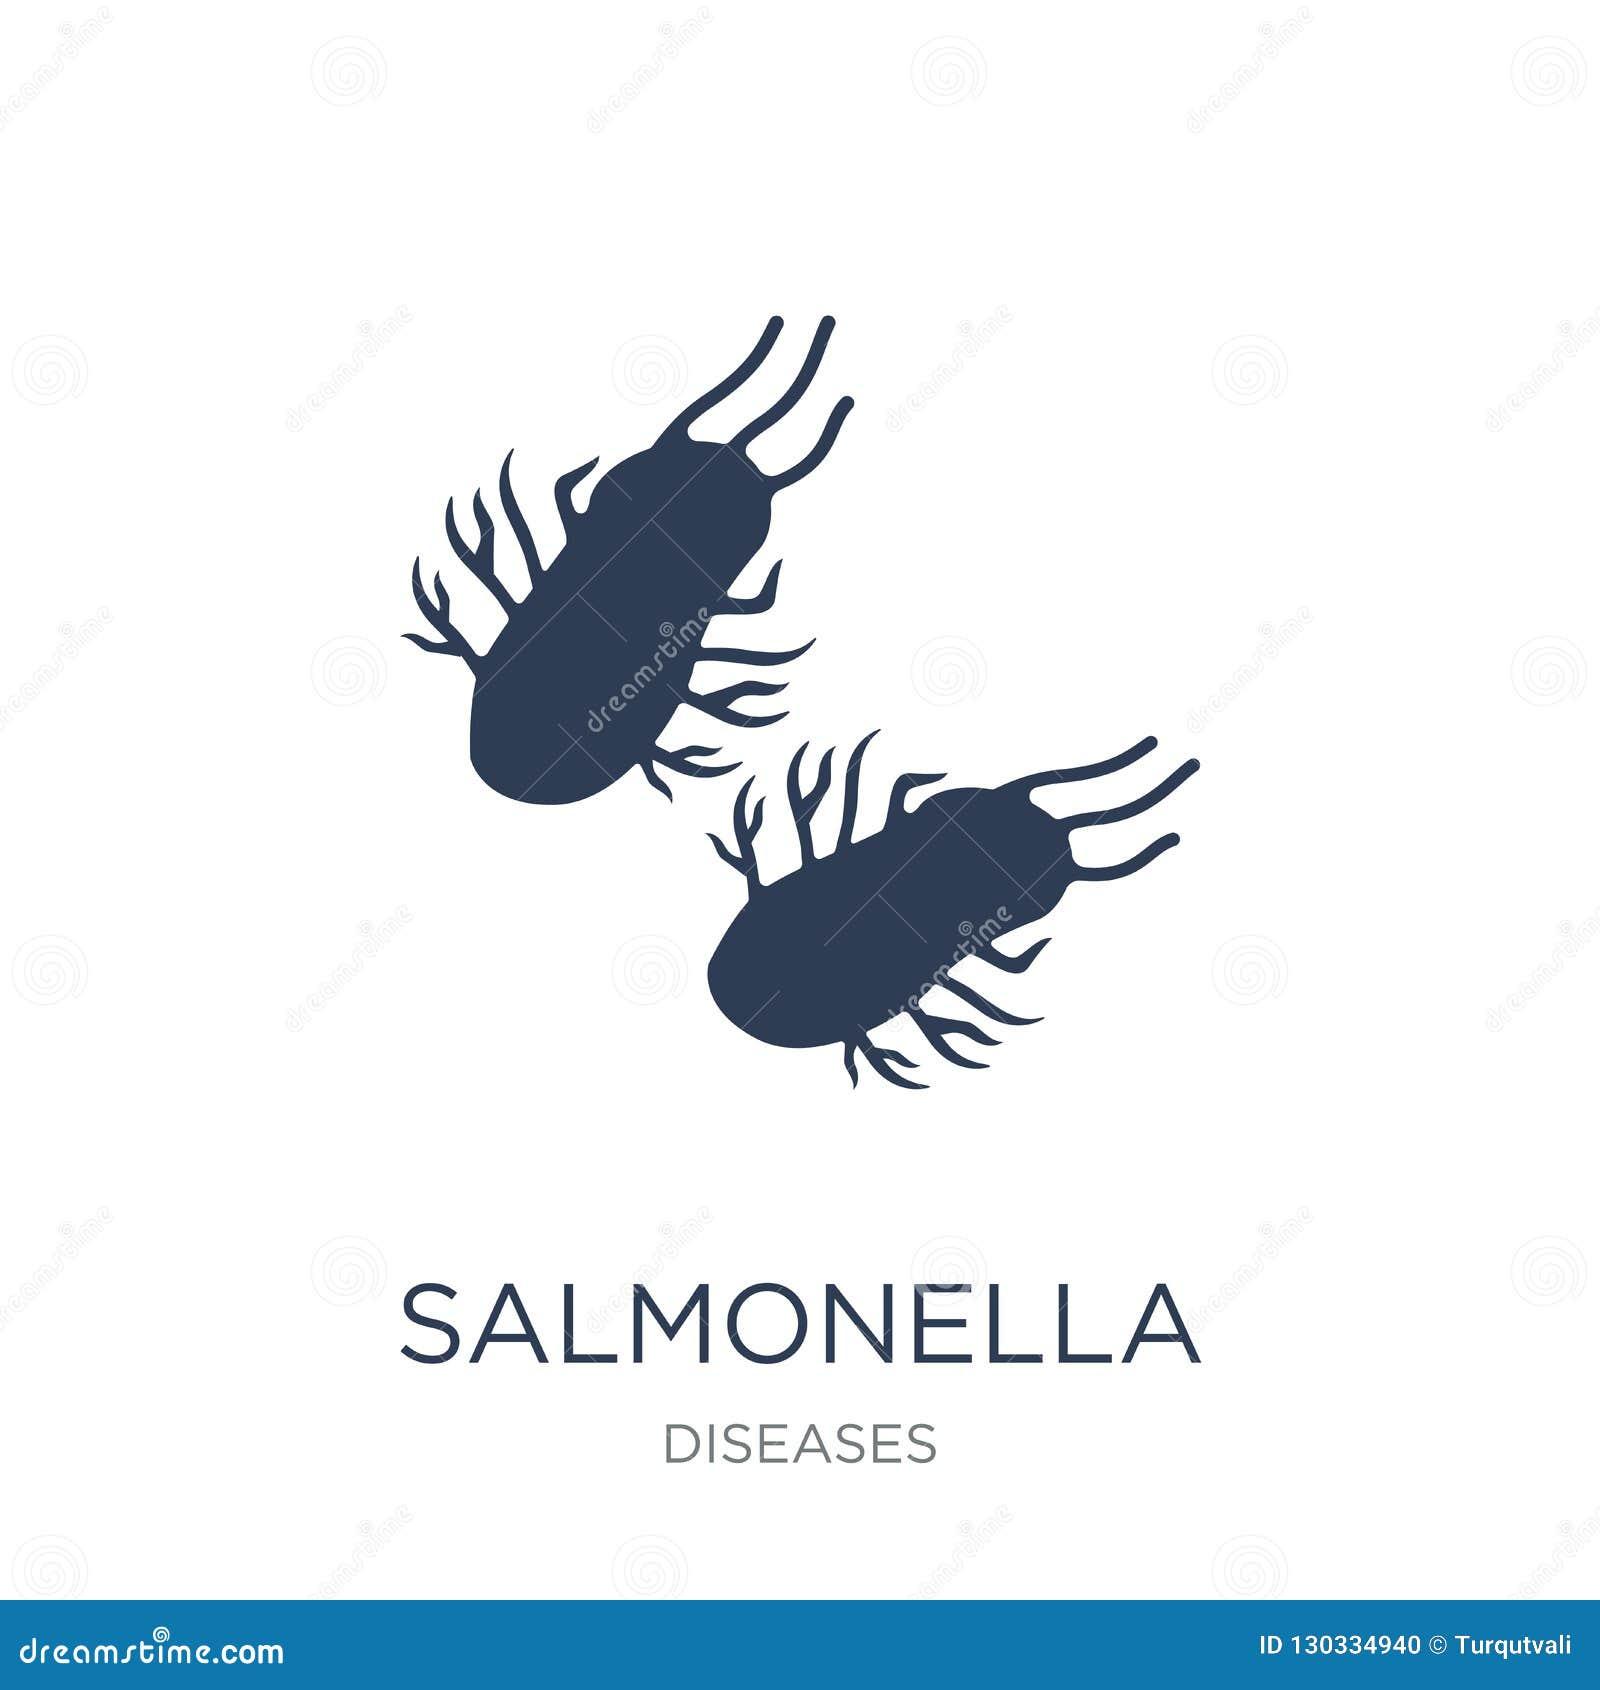 Salmonellenikone